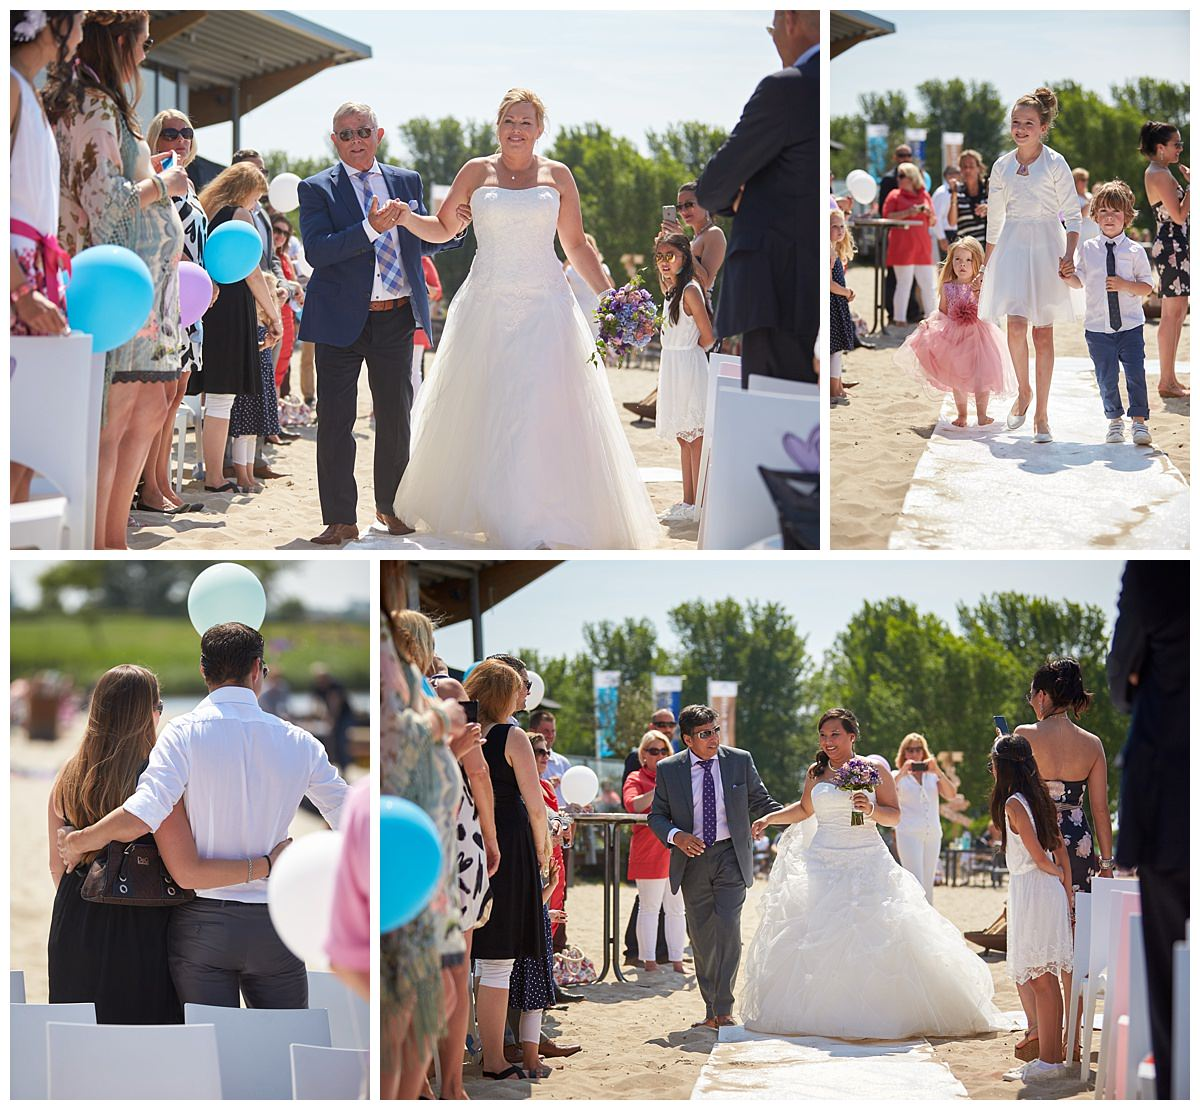 trouwshoot-bruidsfotografie-trouwfoto-feestfotografie-Prunella en Cora26.jpg